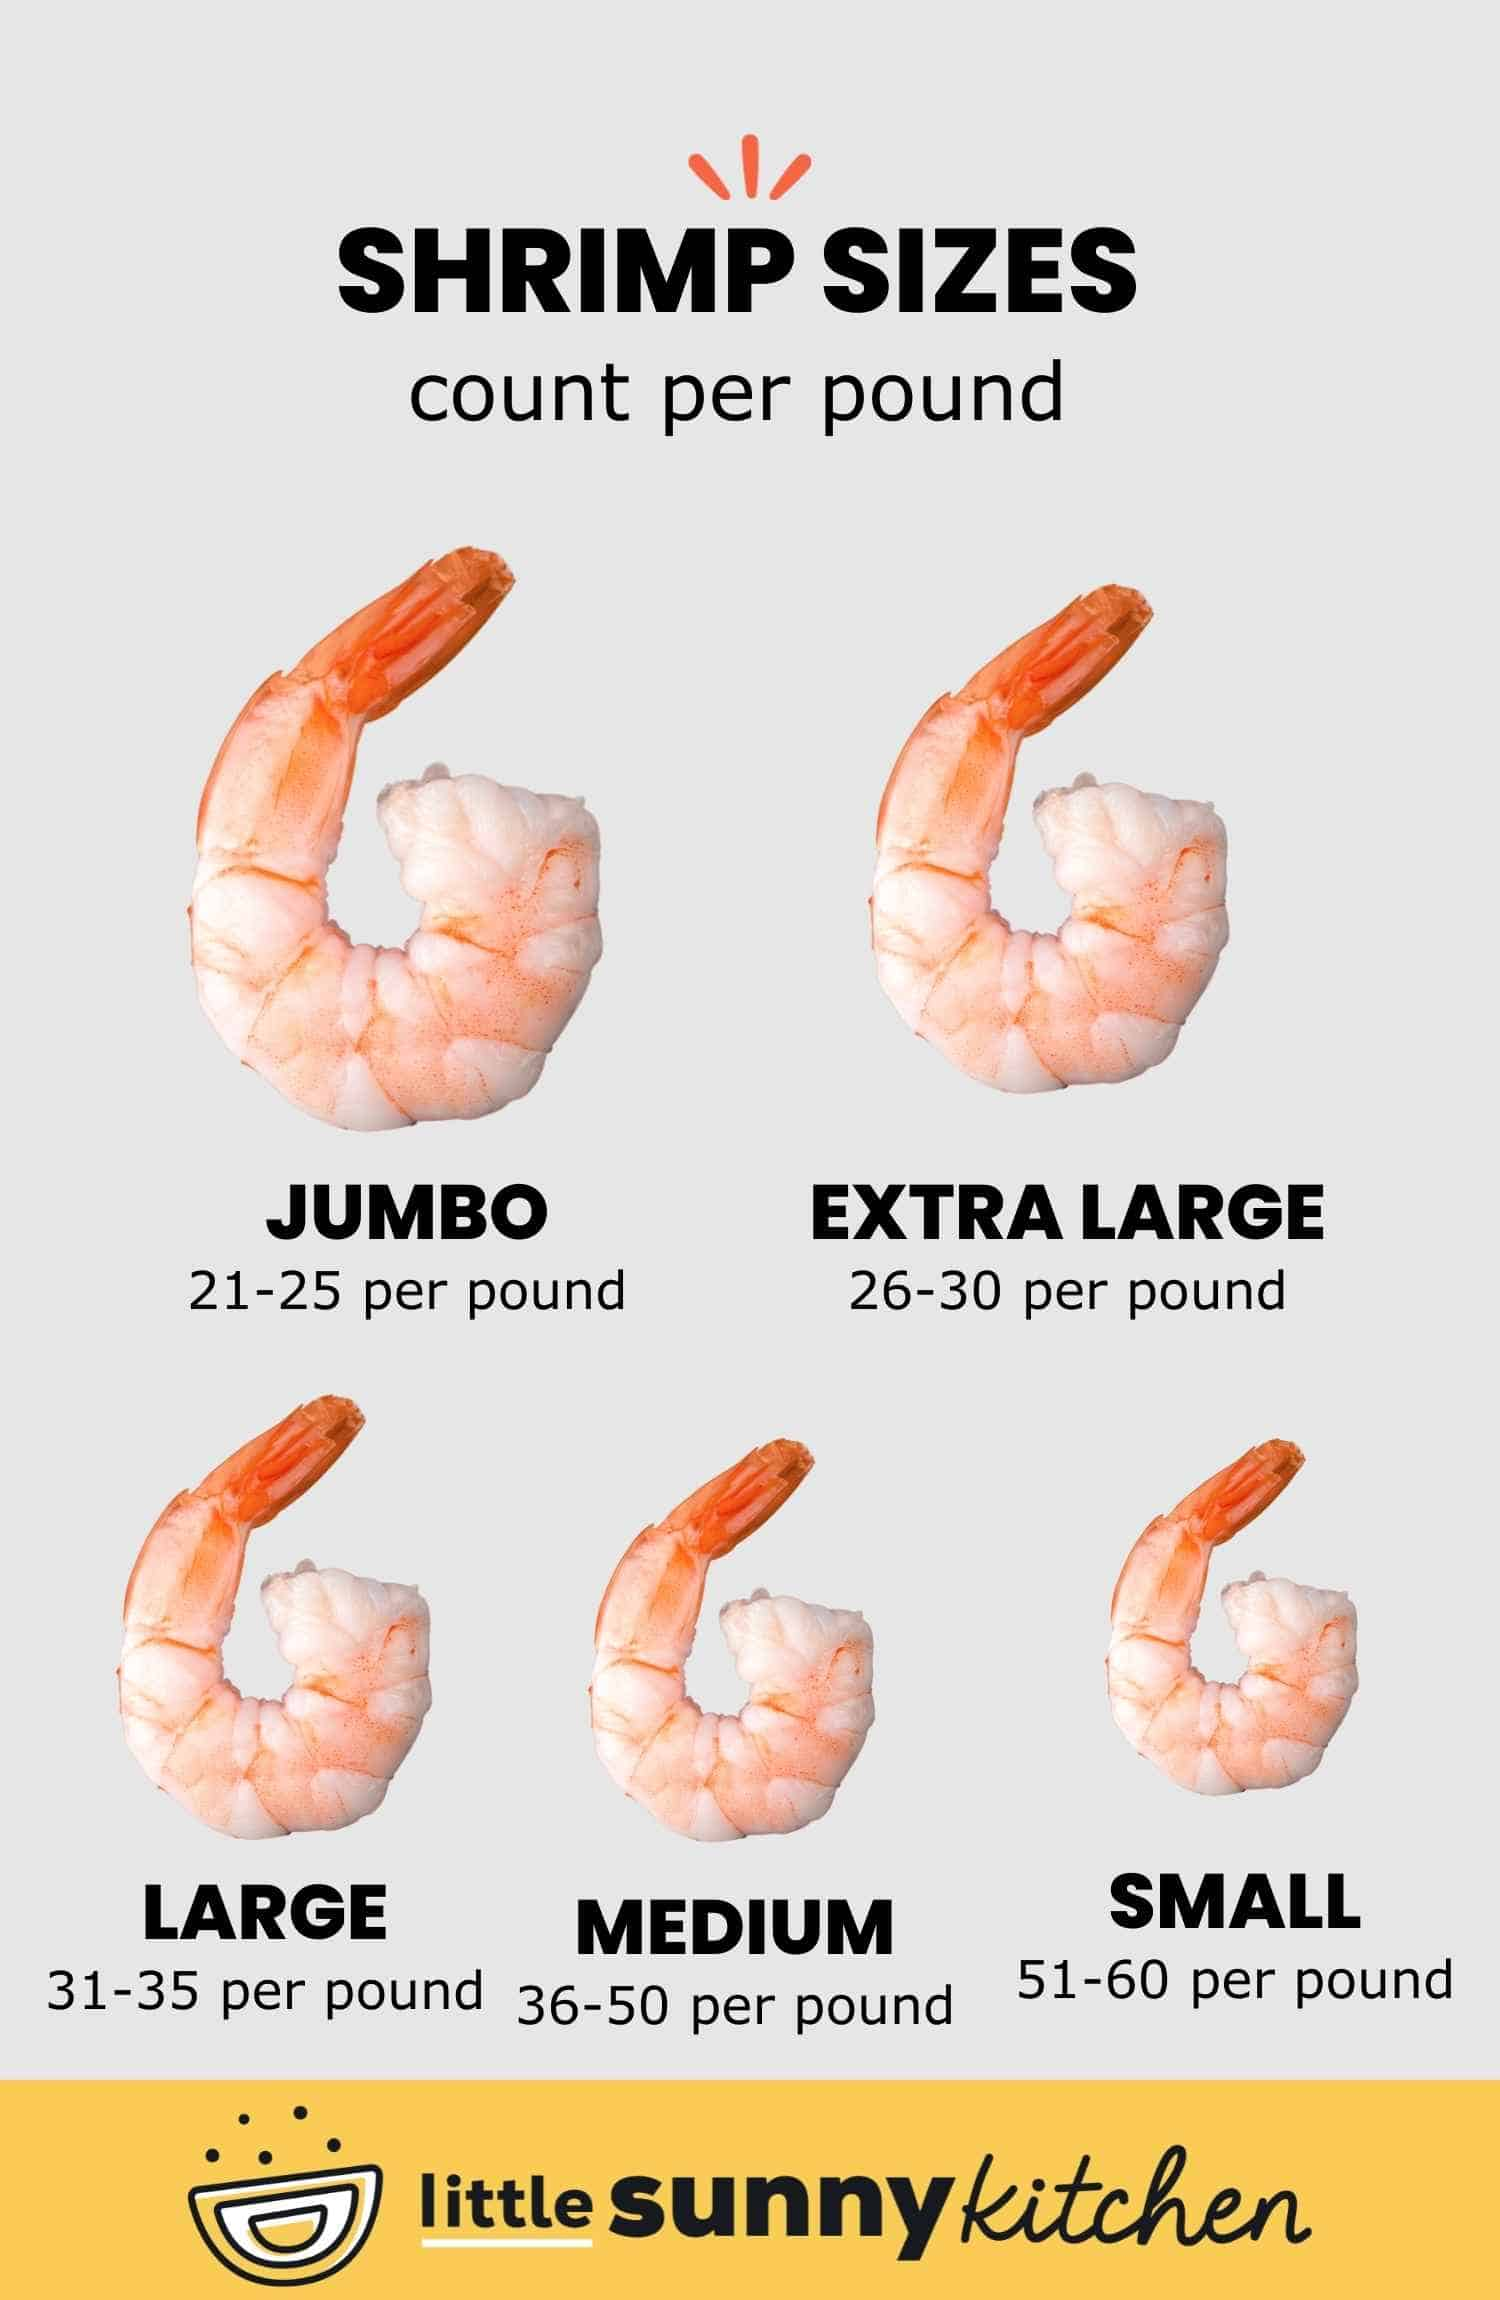 Shrimp sizes count per pound including jumbo, extra large, large, medium, and small.